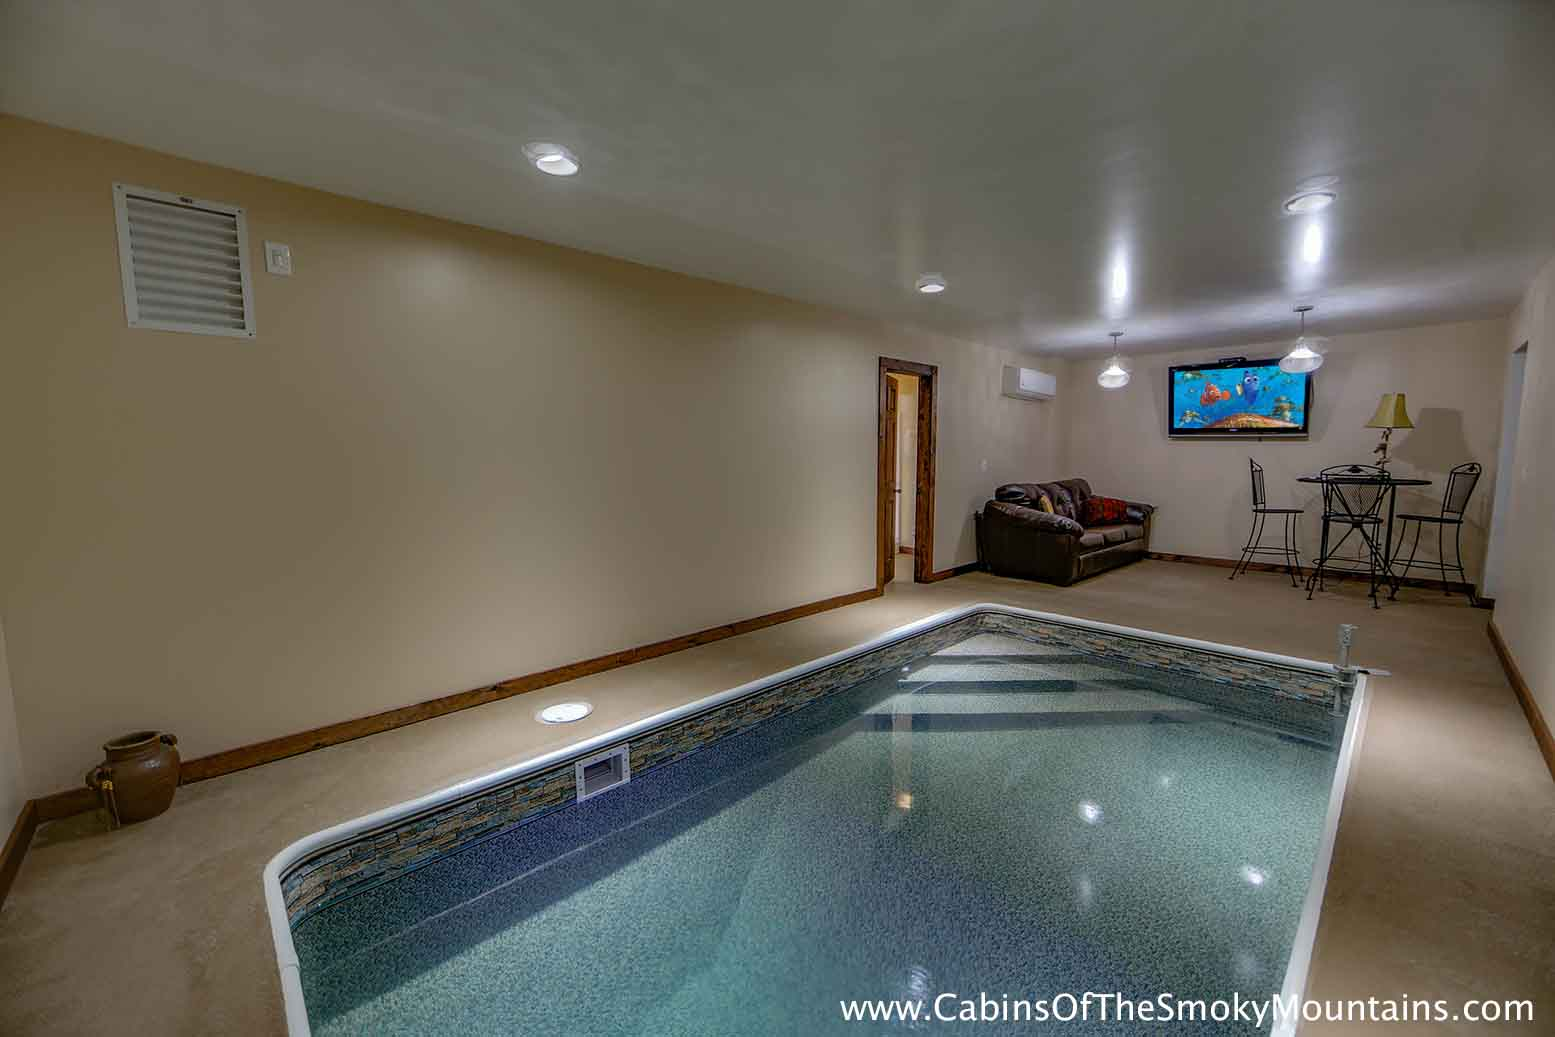 Gatlinburg Cabins With Indoor Private Pools